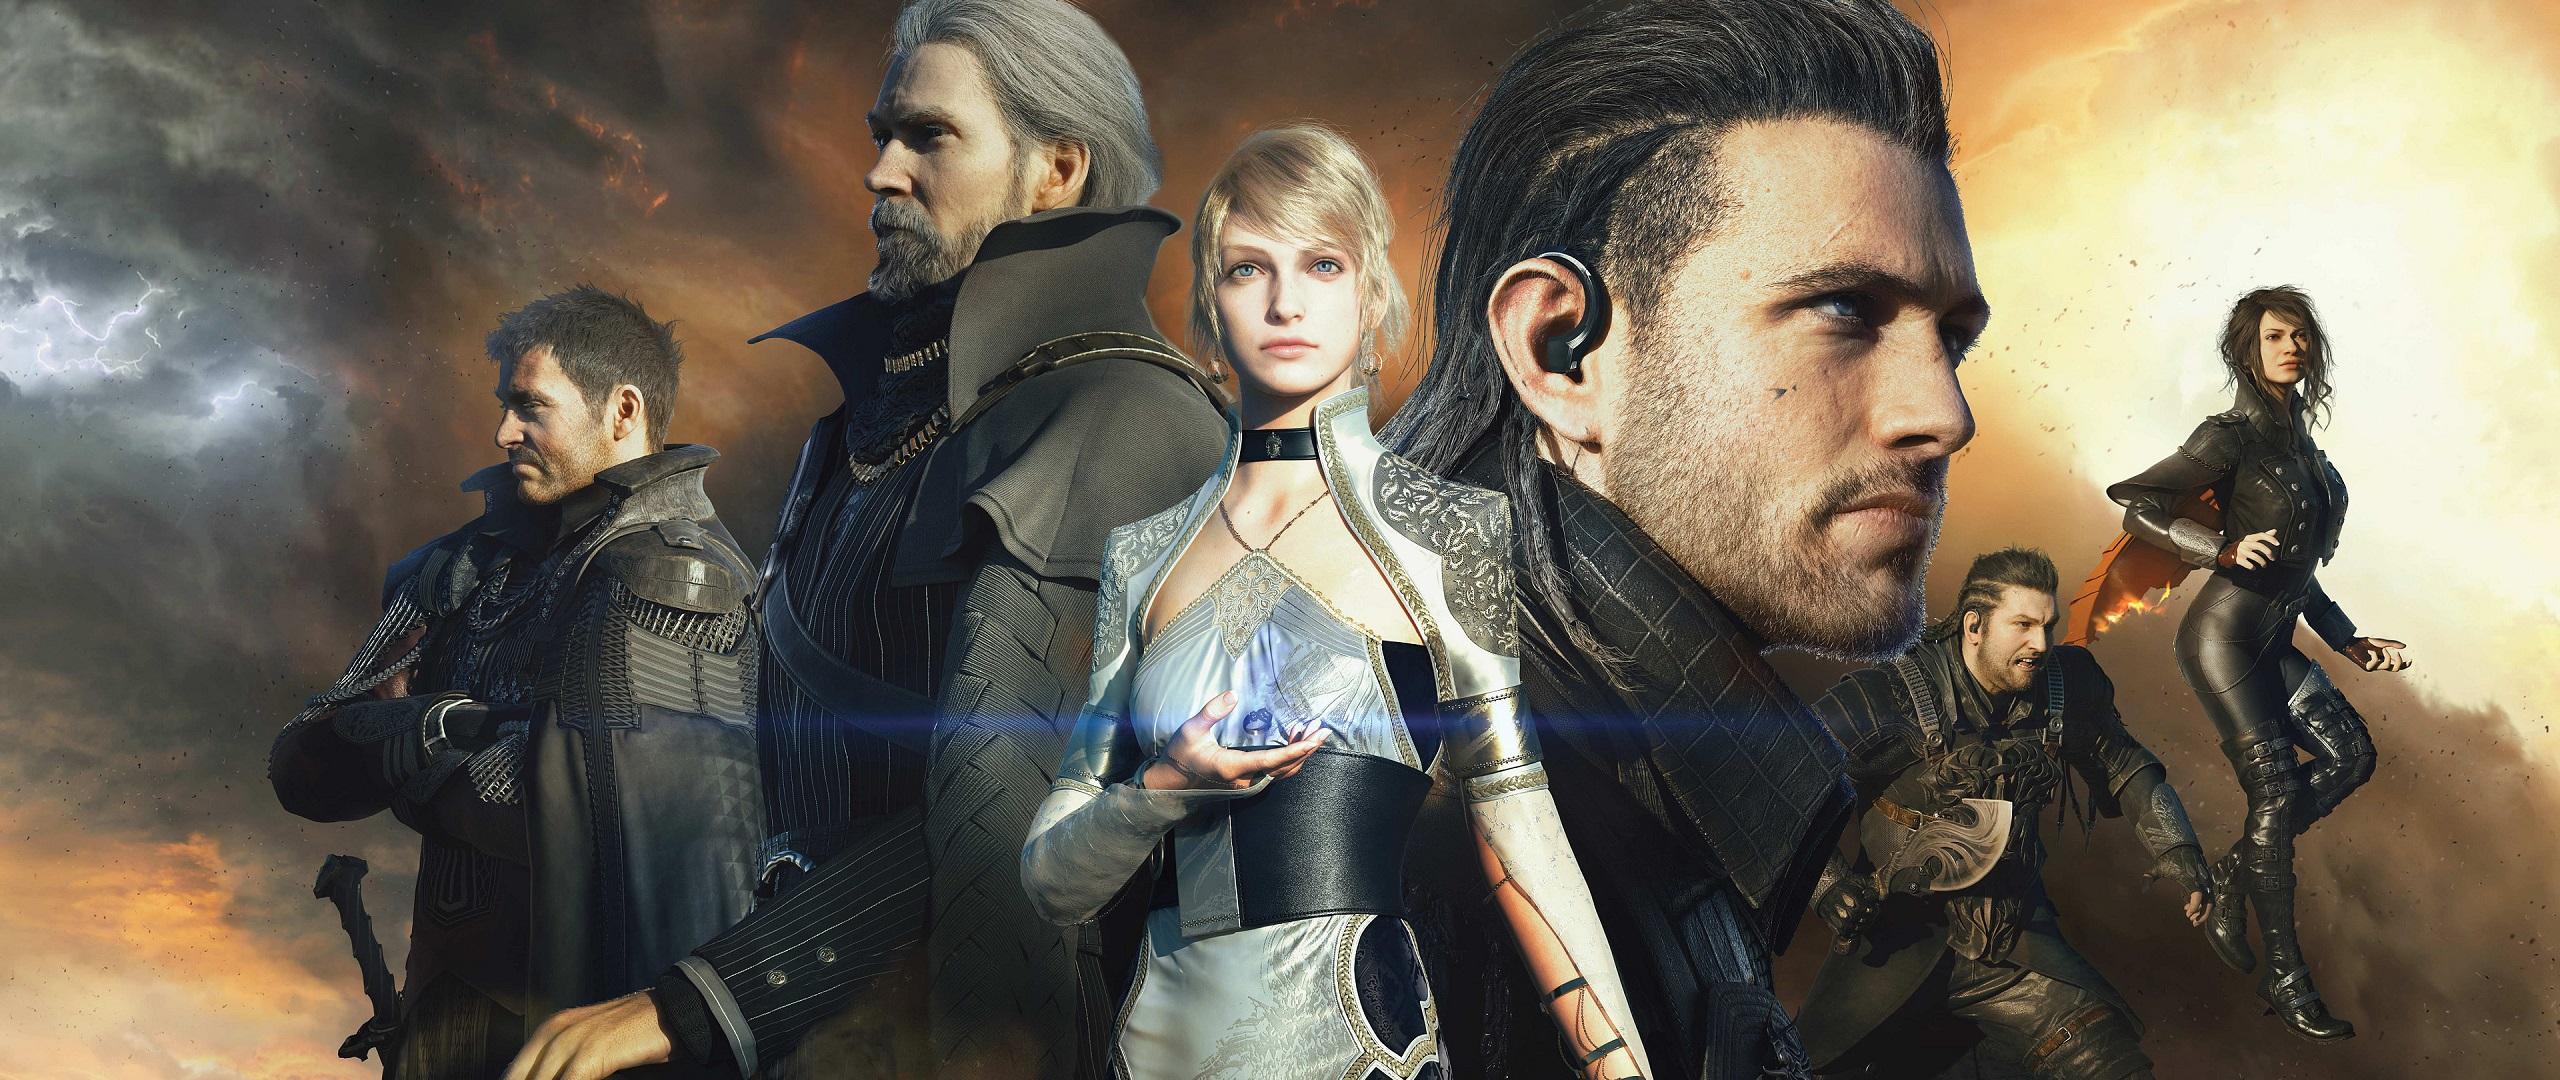 Kingsglaive Final Fantasy XV HD Wallpaper Background